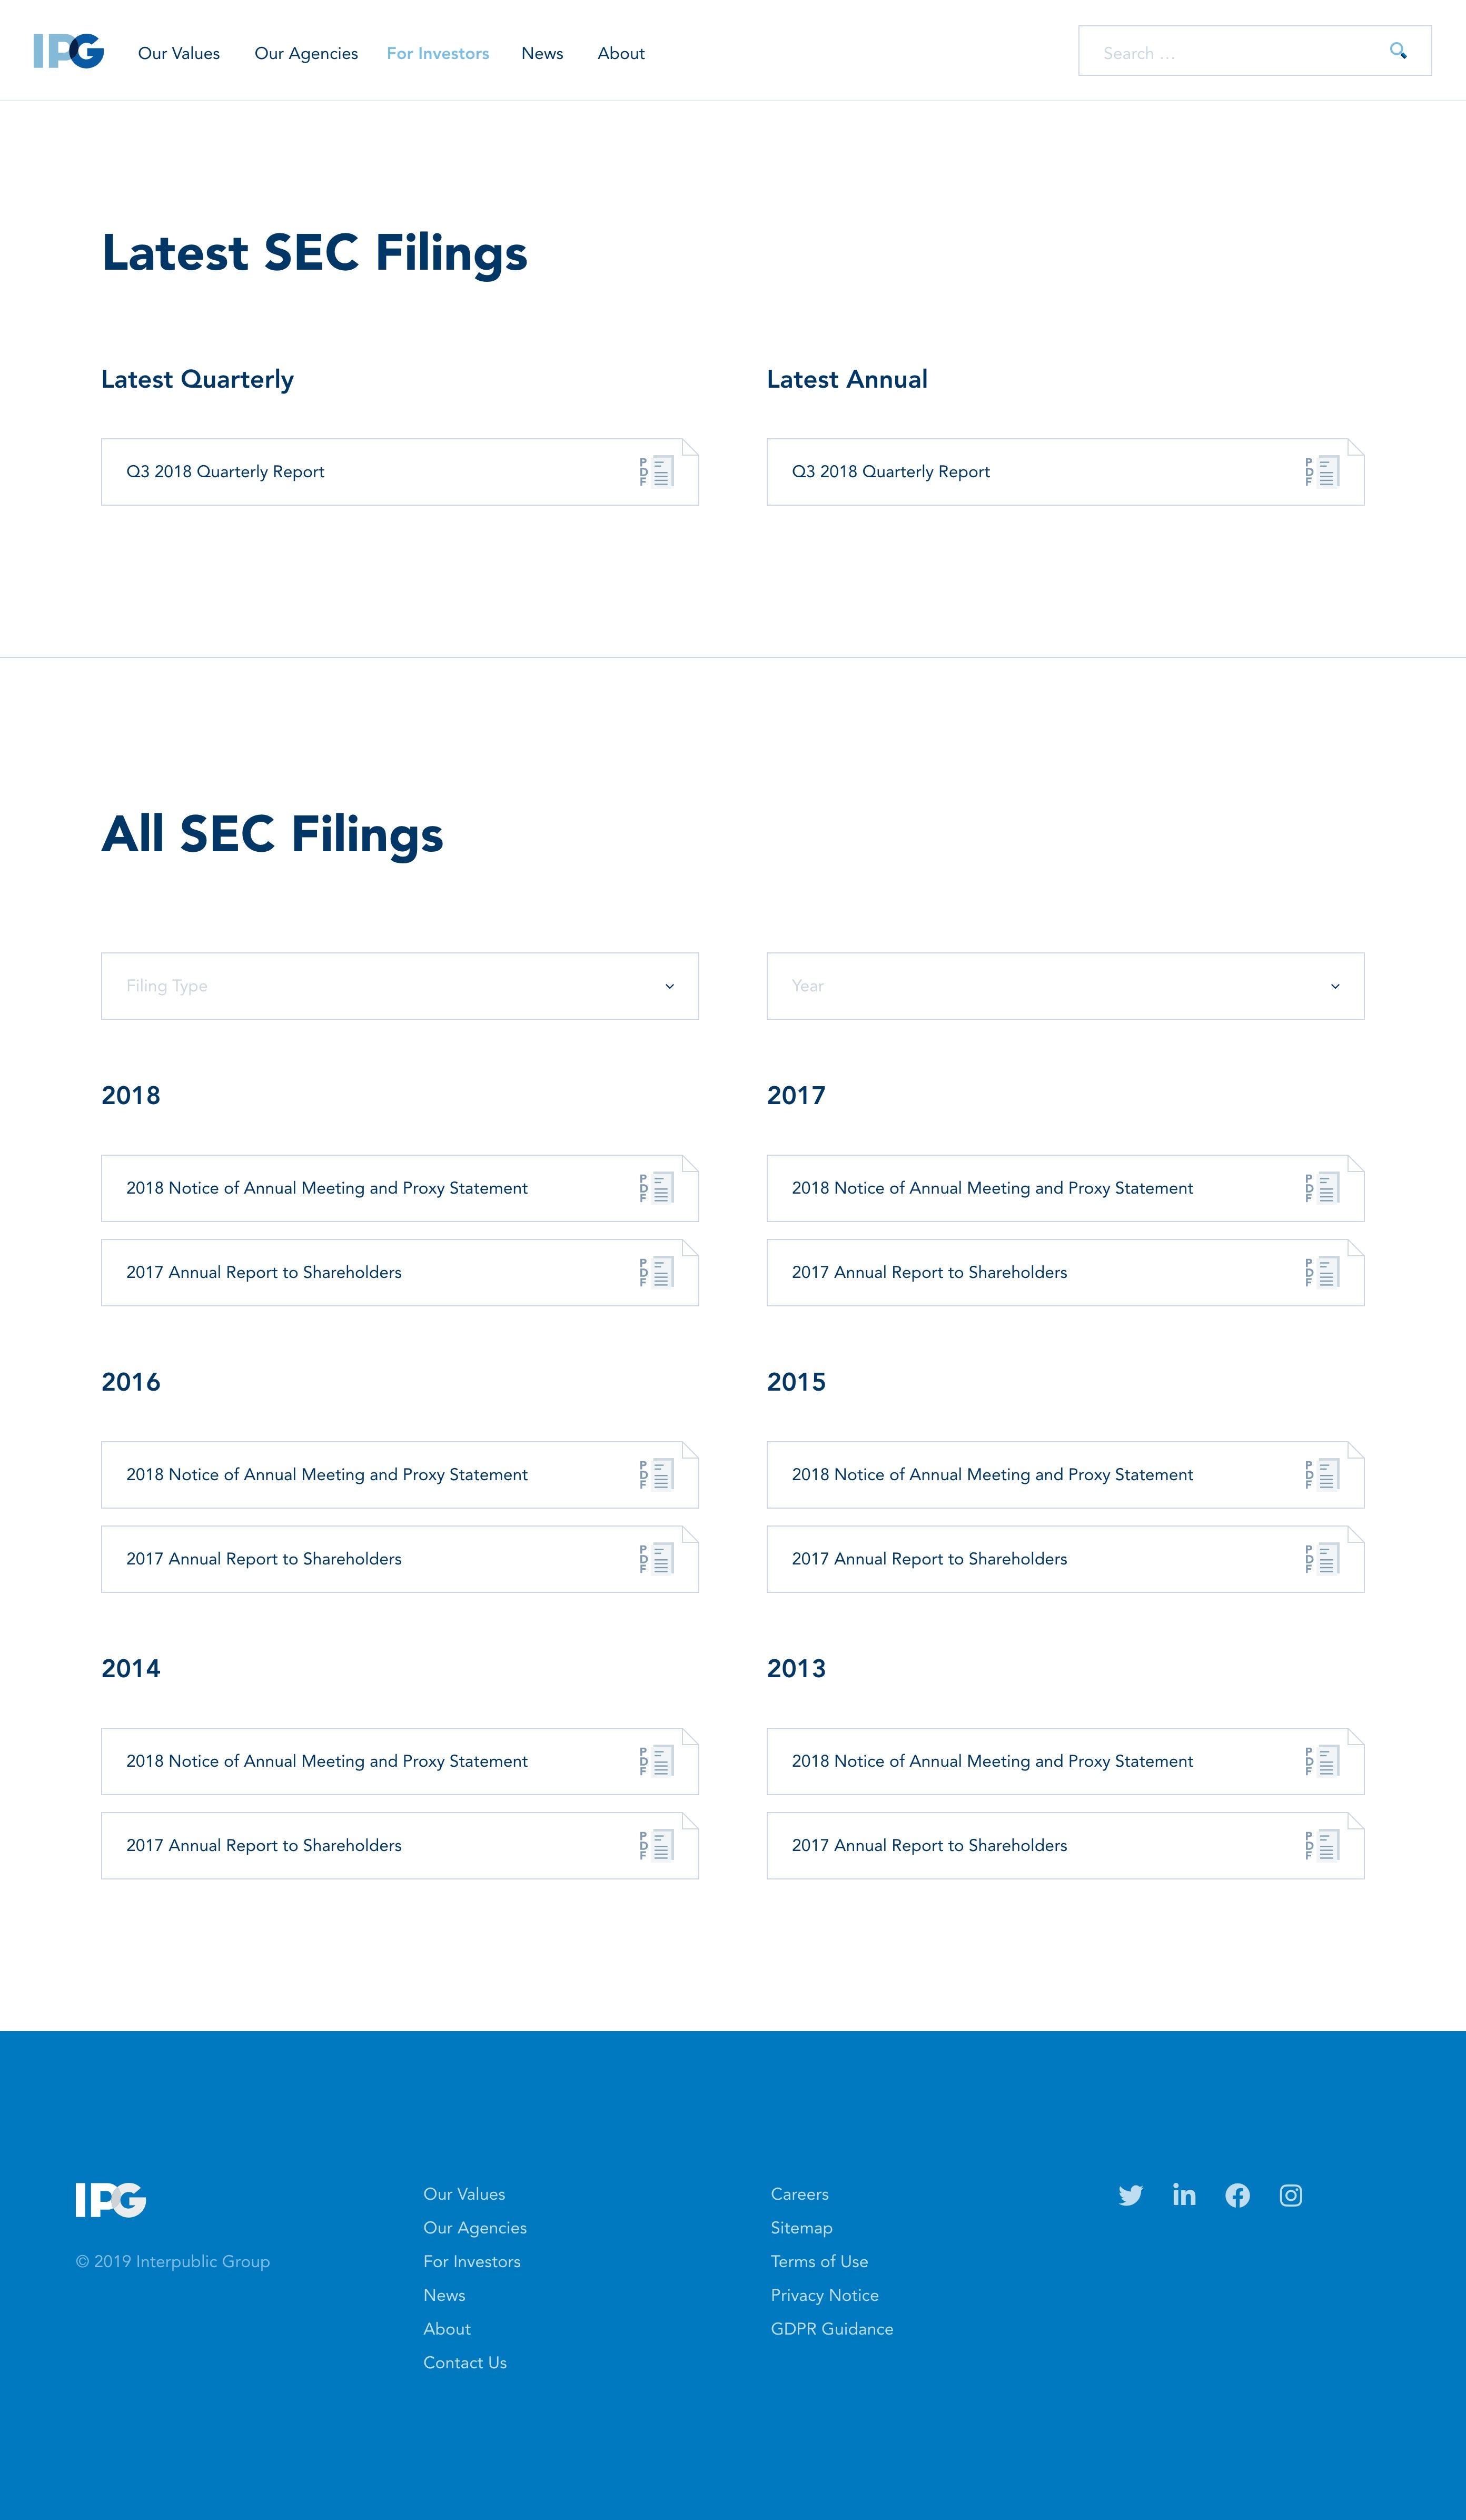 SEC Filings page